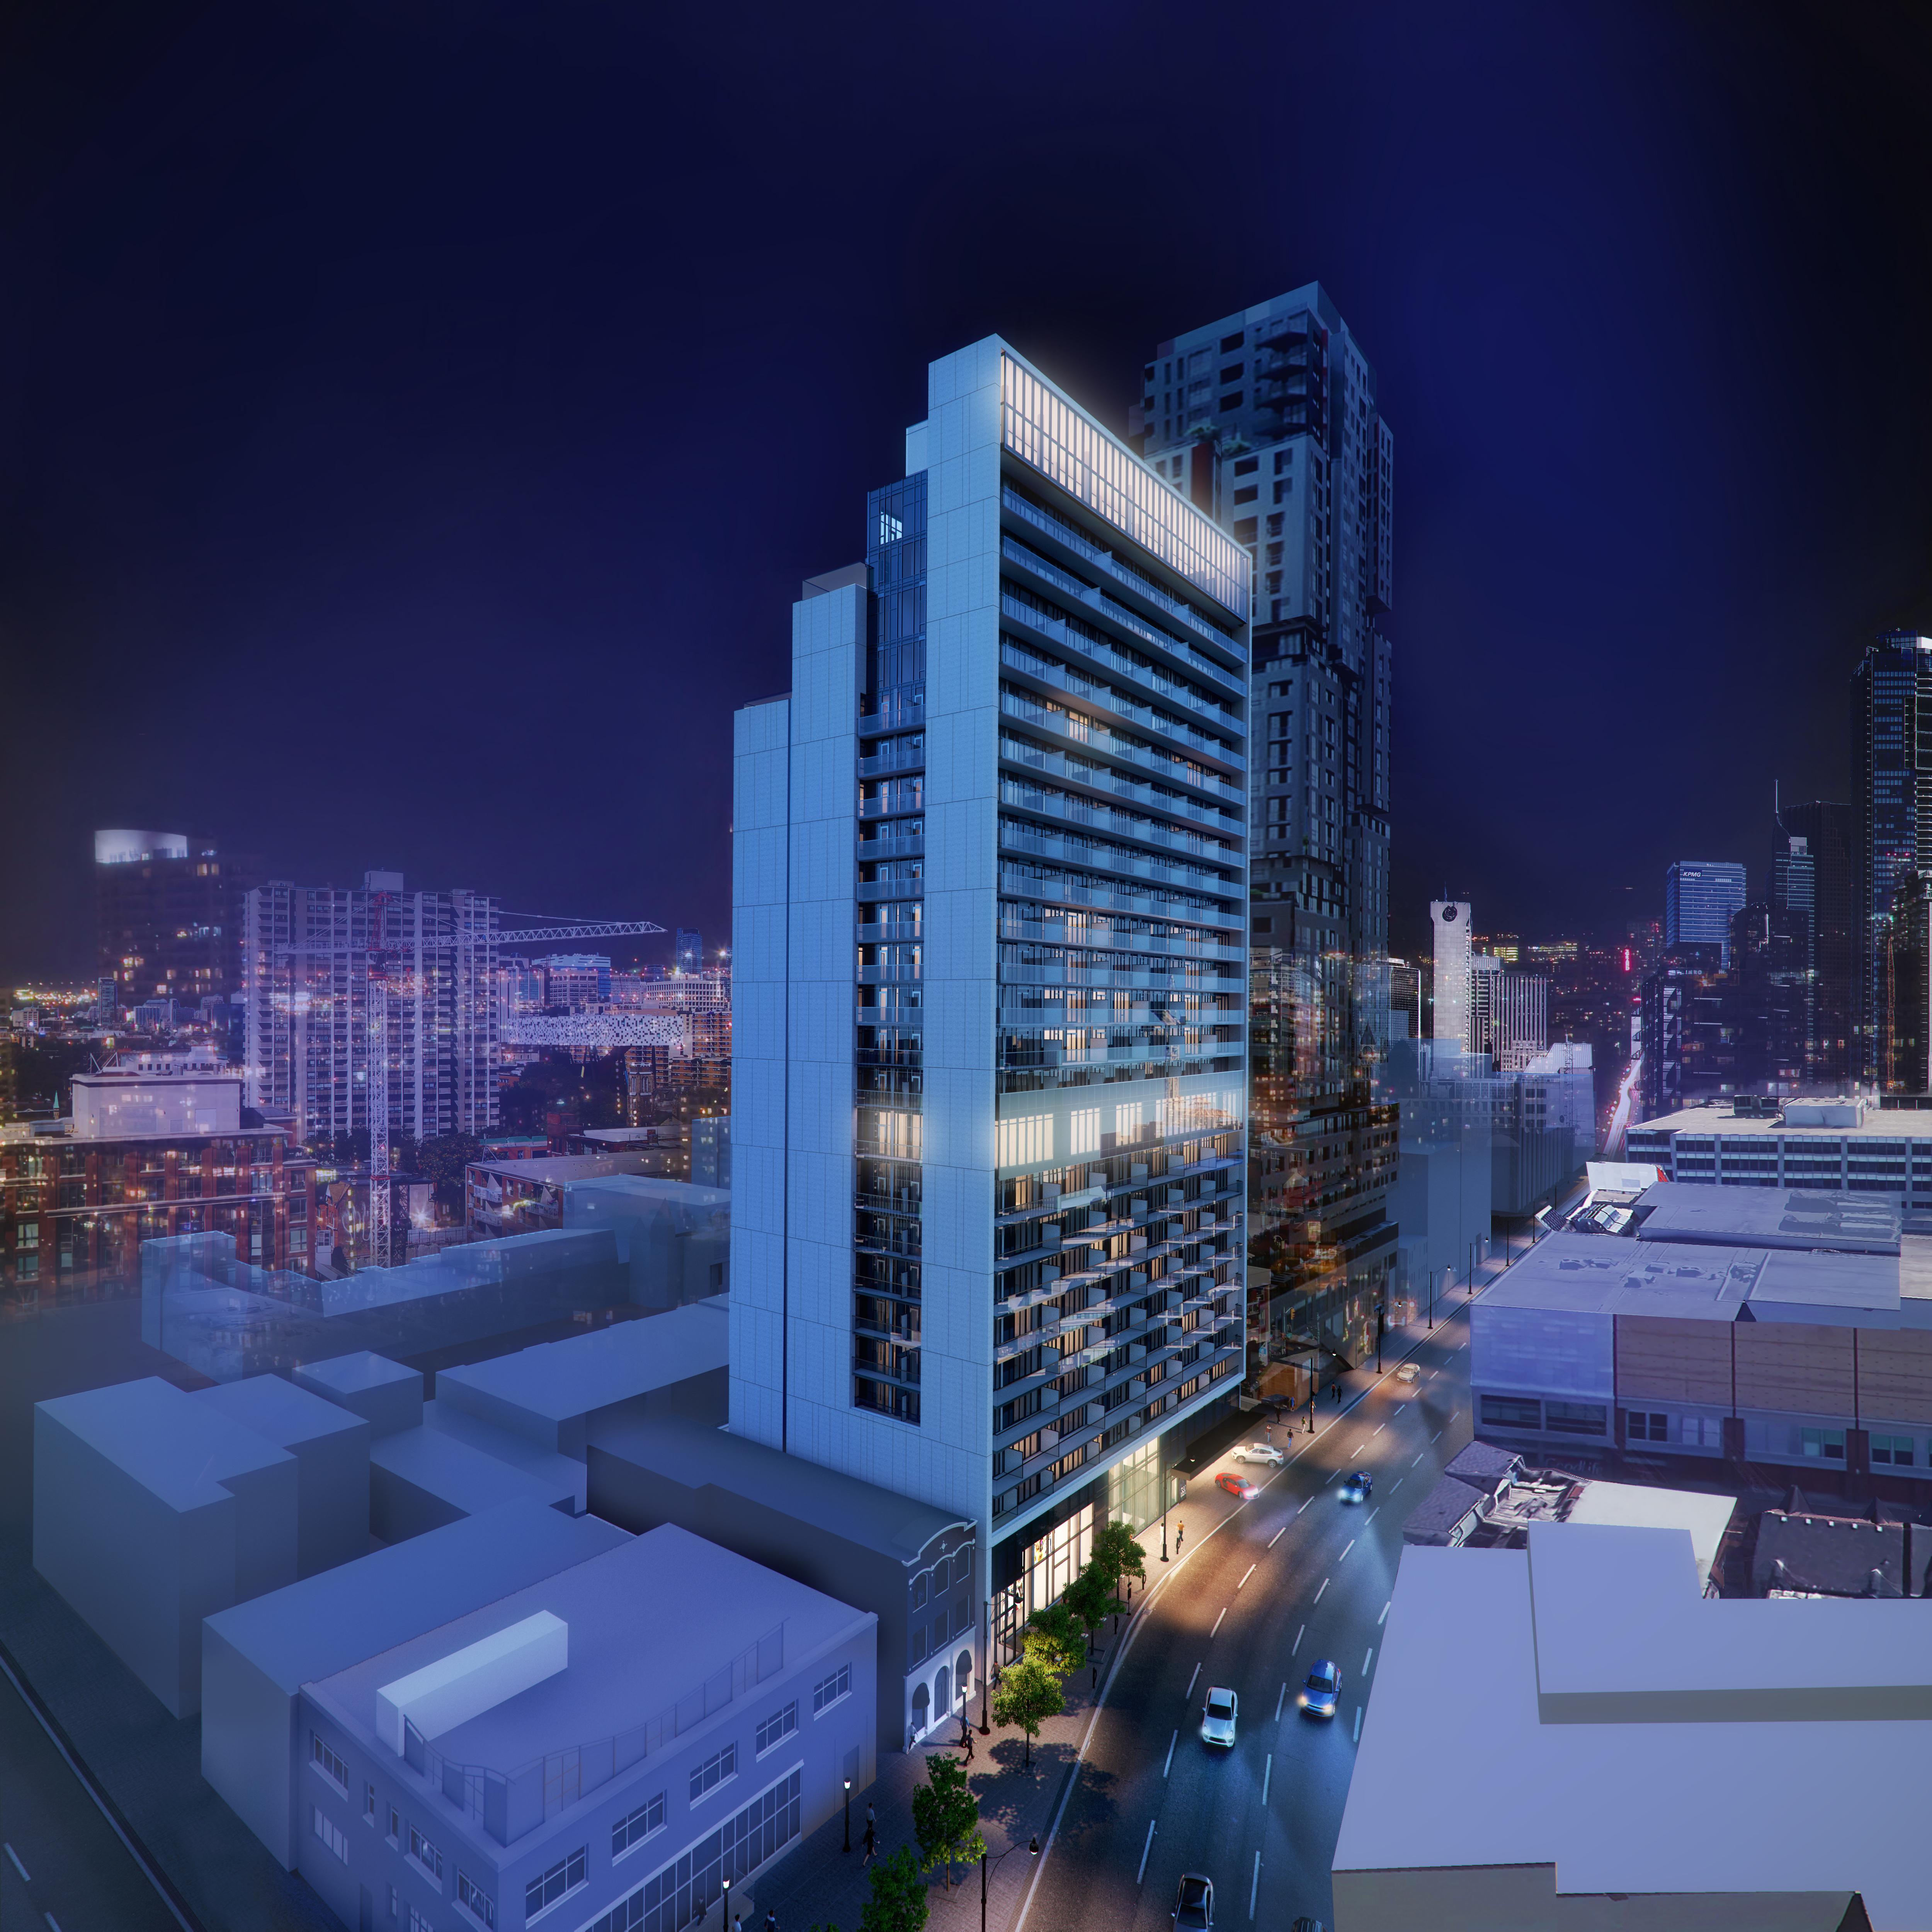 www-330richmond-net-330-richmond-condos-building-night